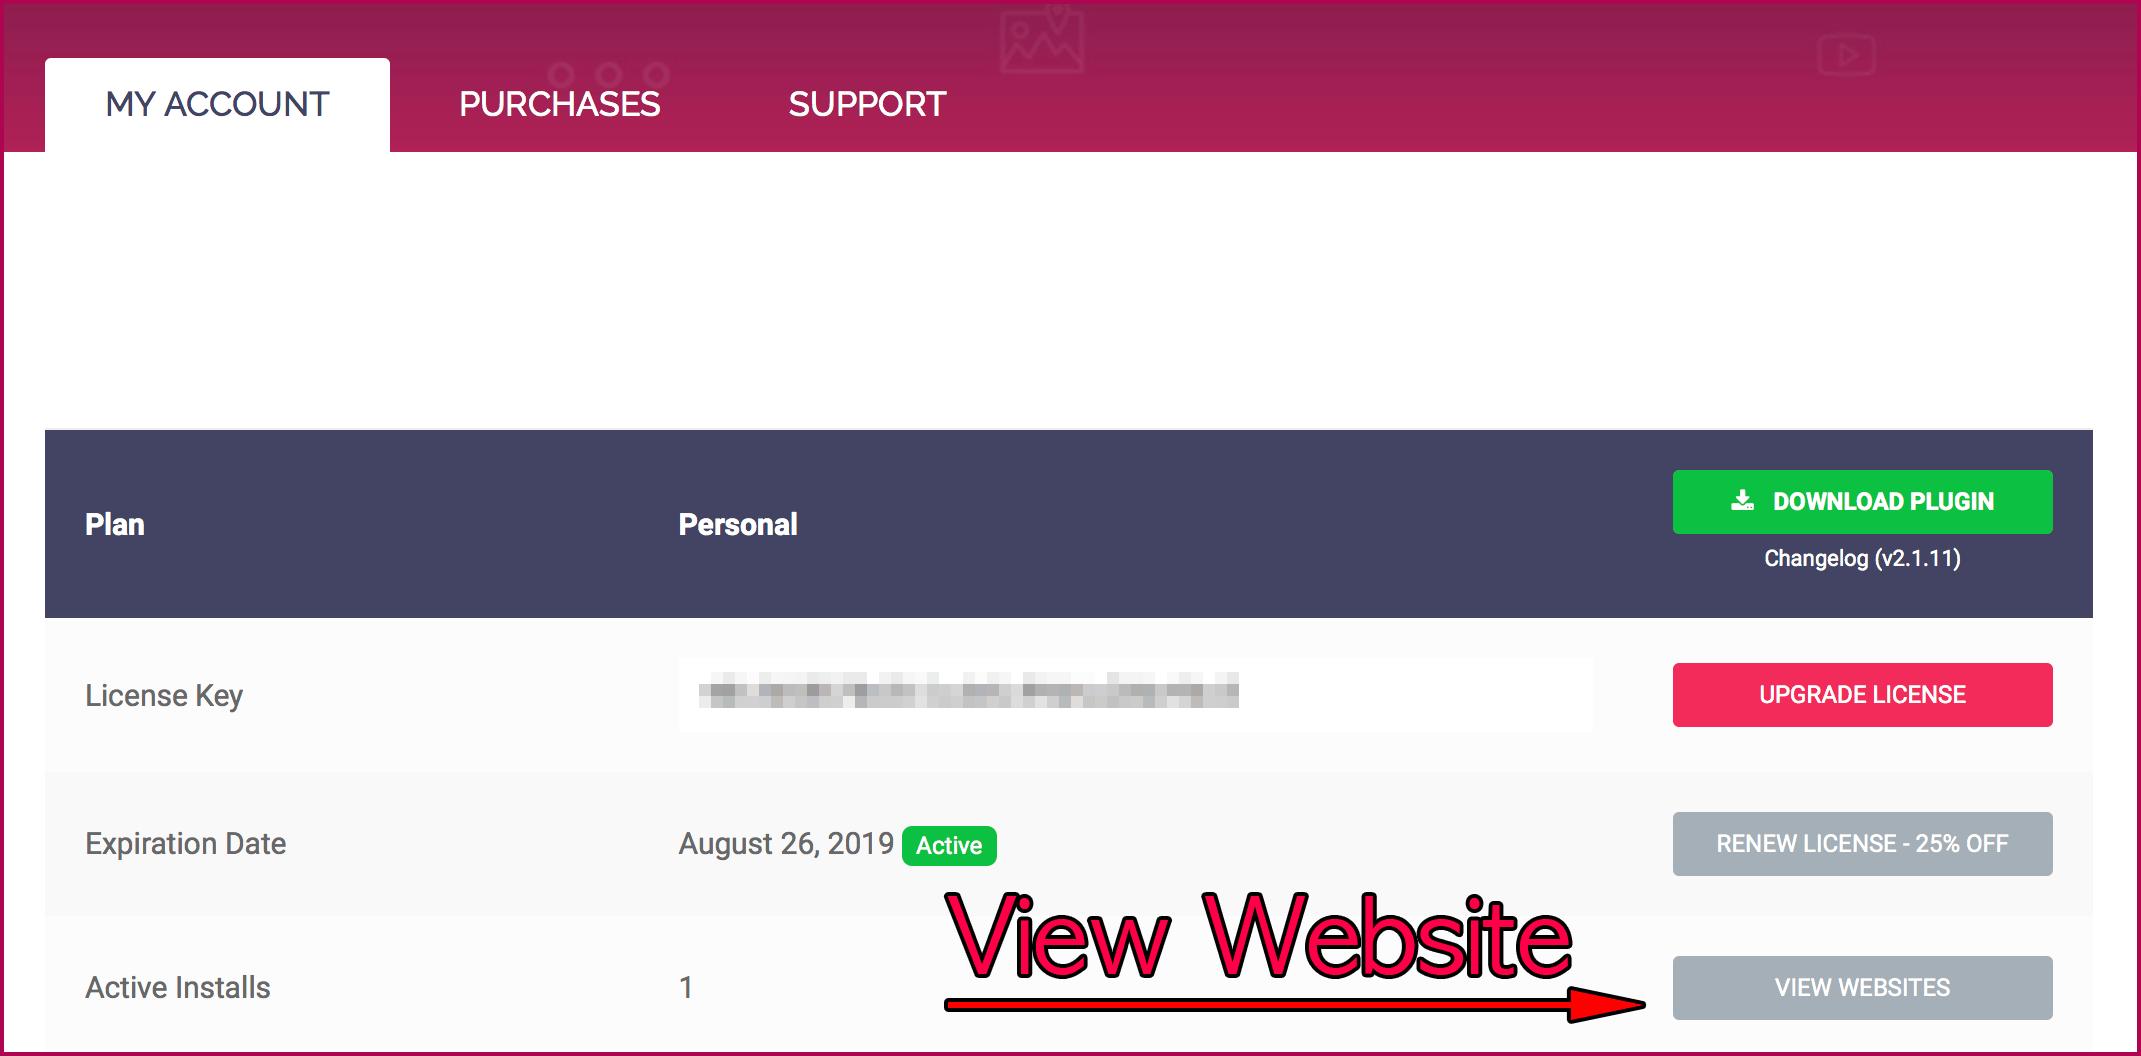 View Website 버튼 클릭